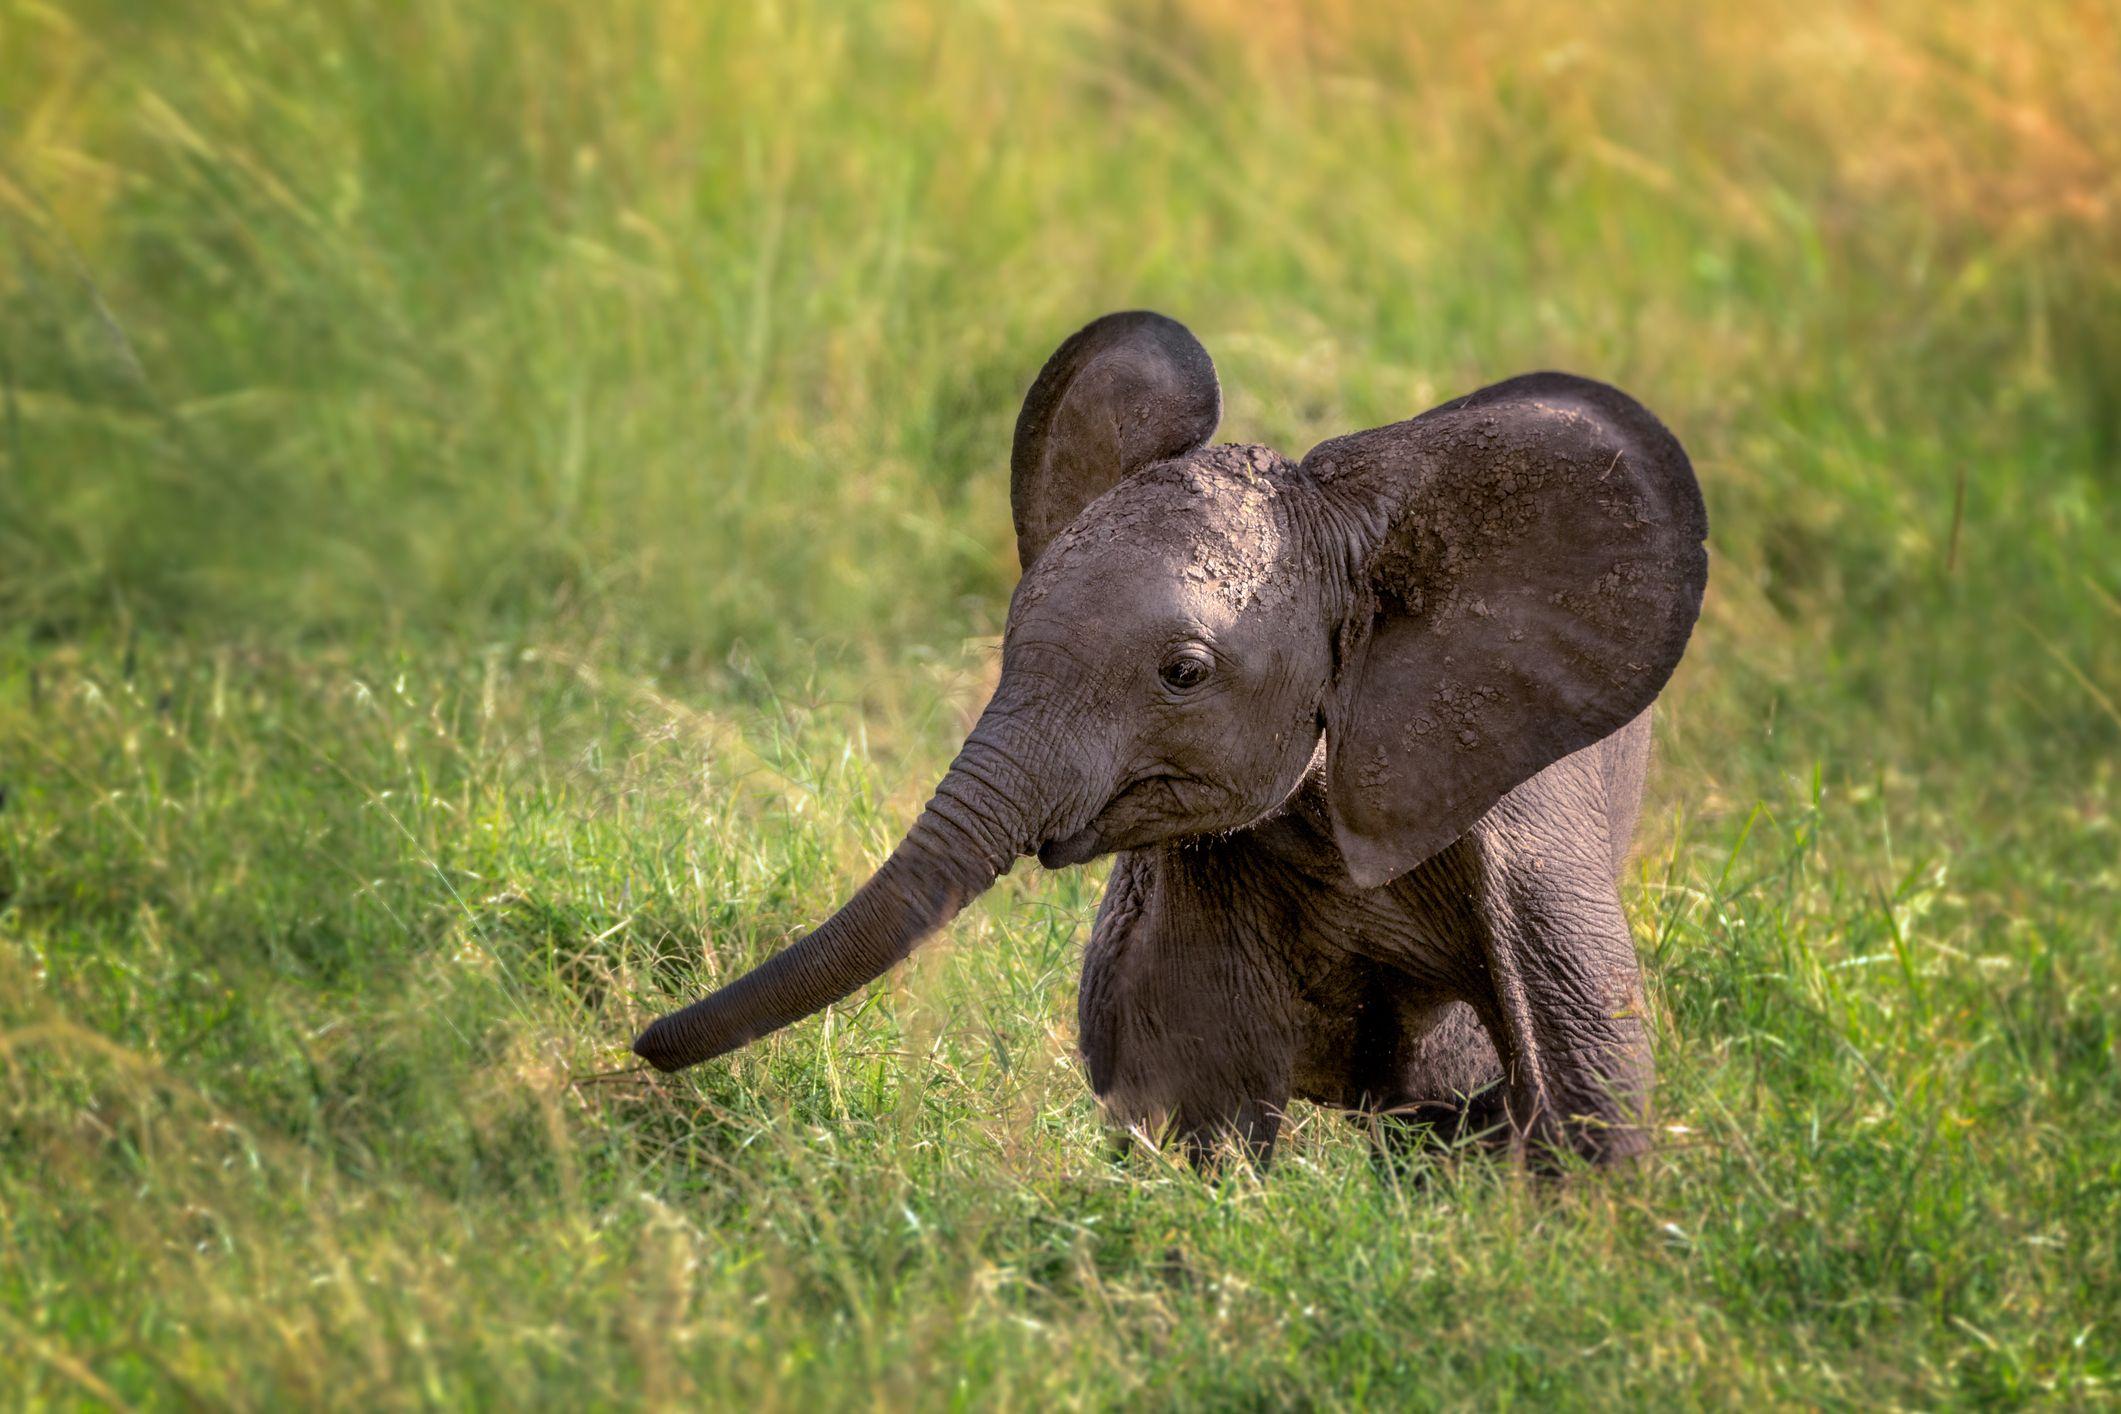 Elephants are born blind.